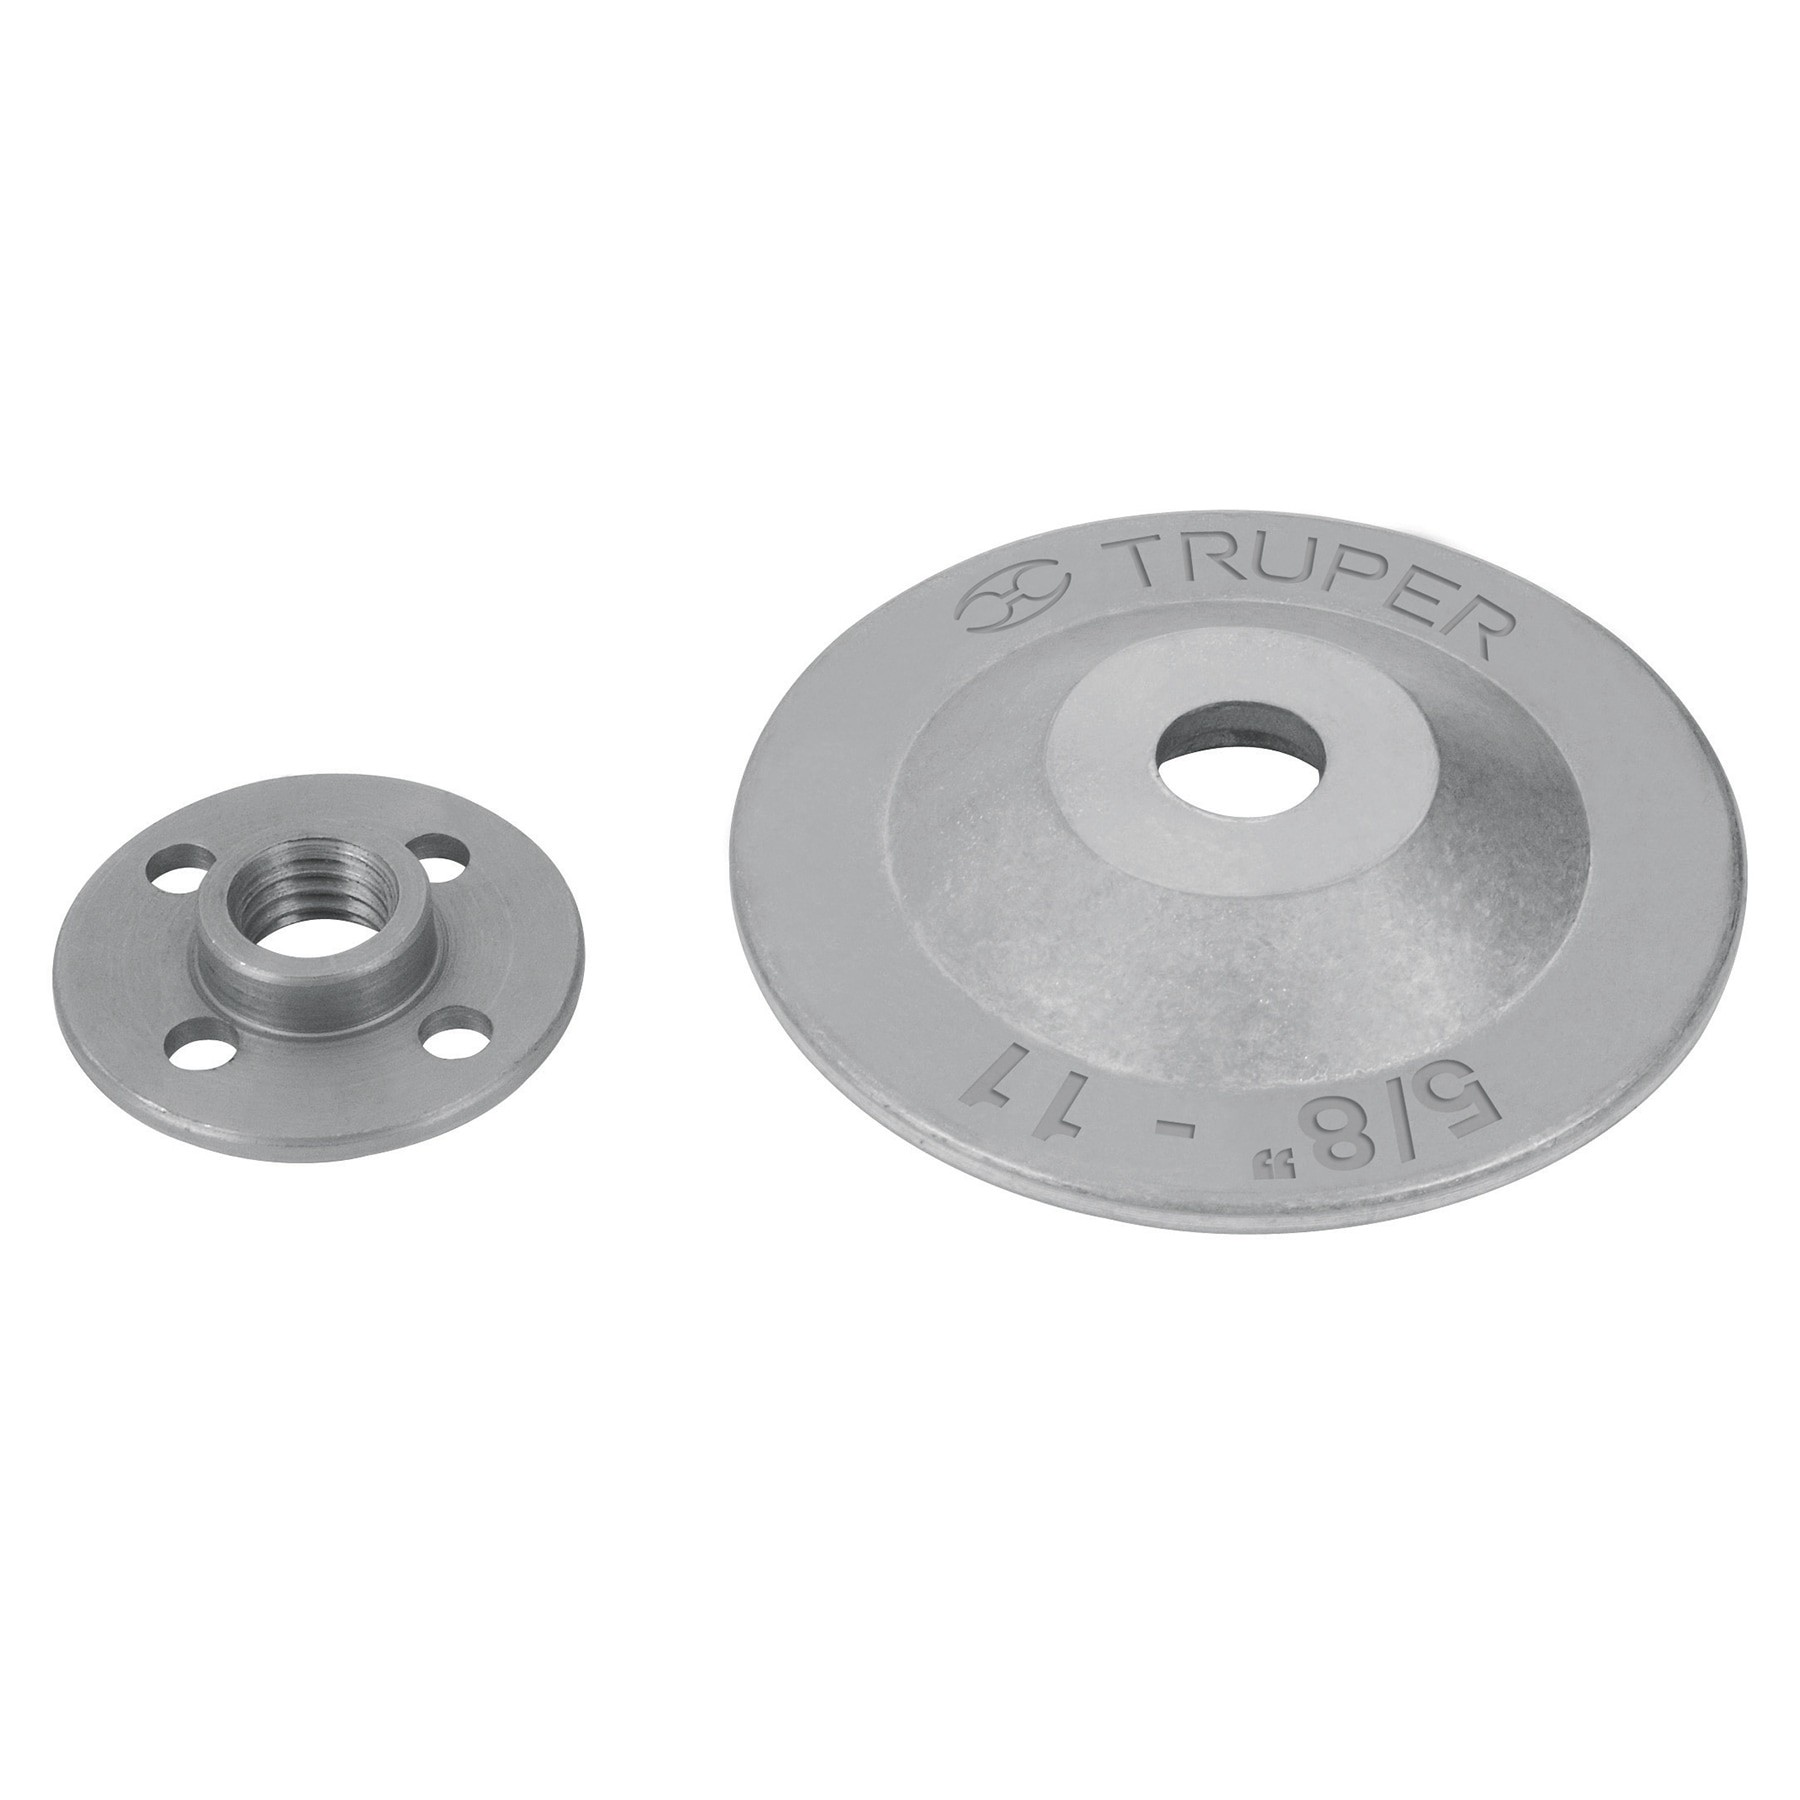 "Adaptador para discos tipo 42, rosca 5/8-11 NC, de 7-9"""